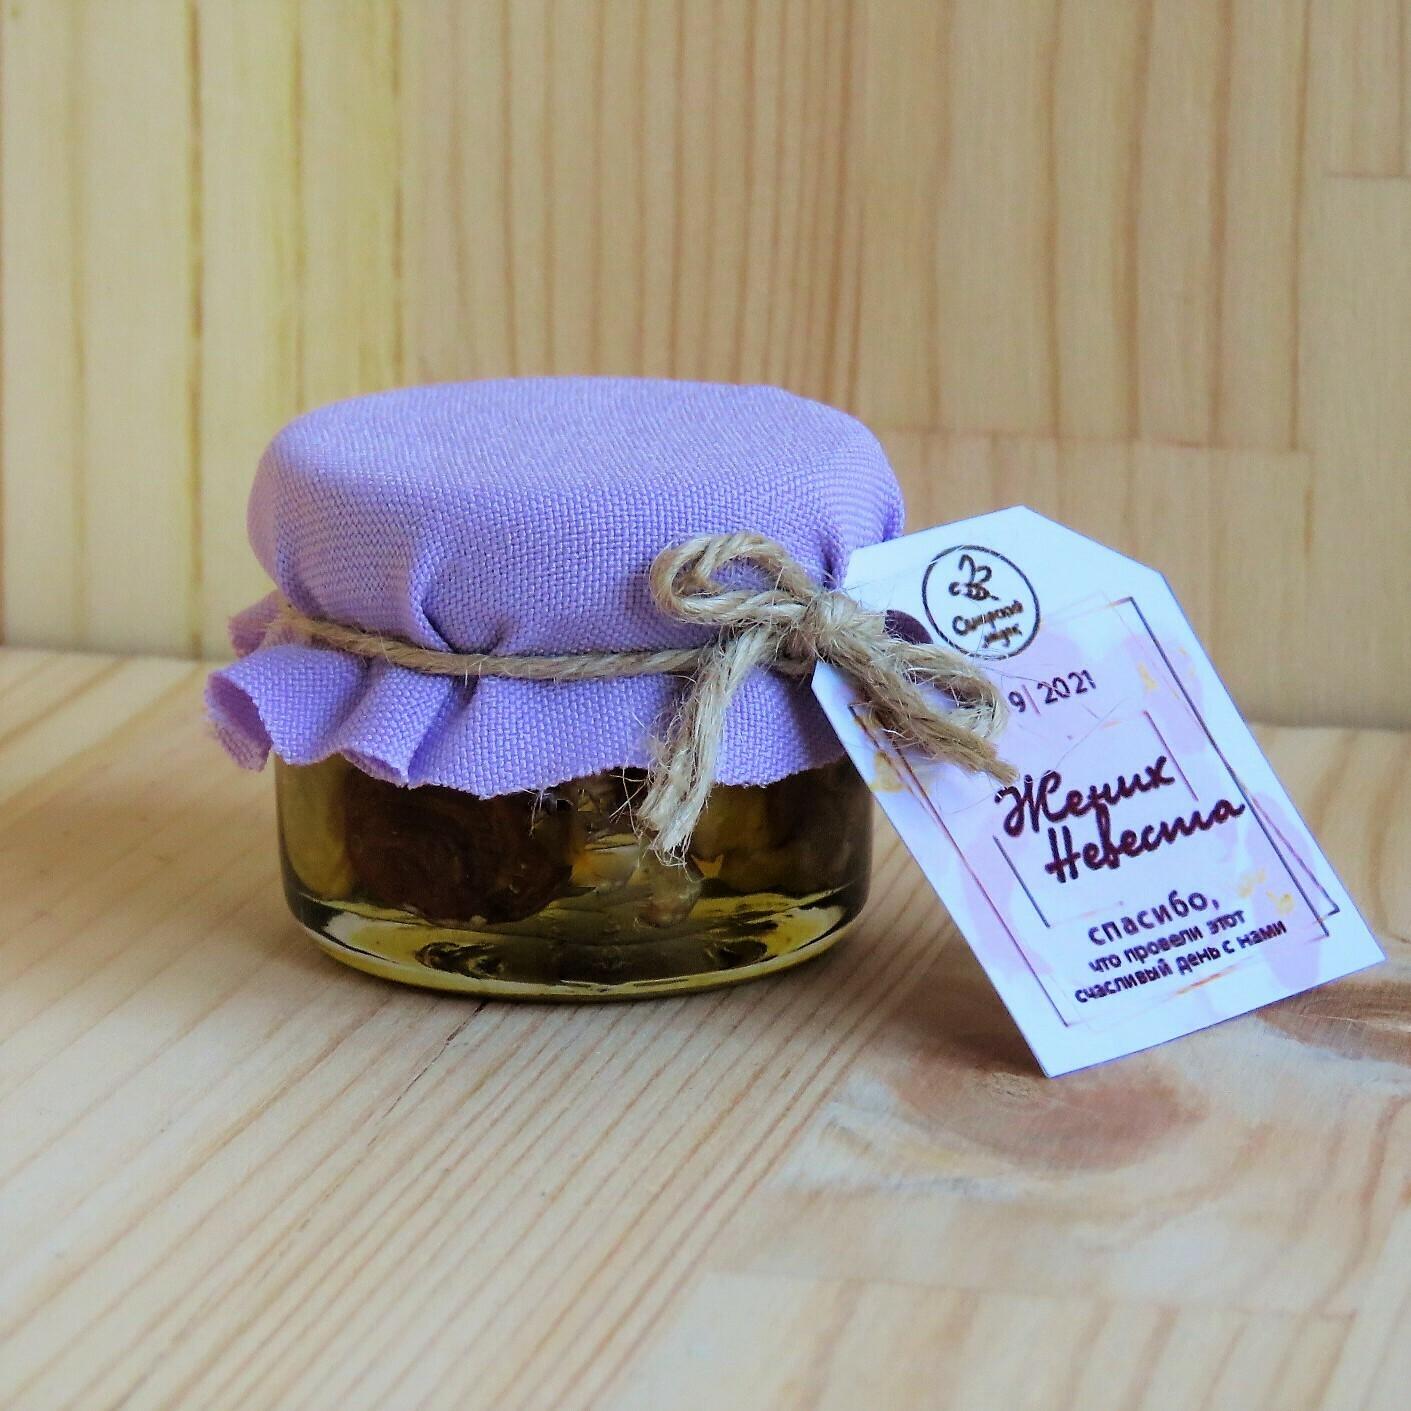 Баночка с орешками в меду, 25 мл.